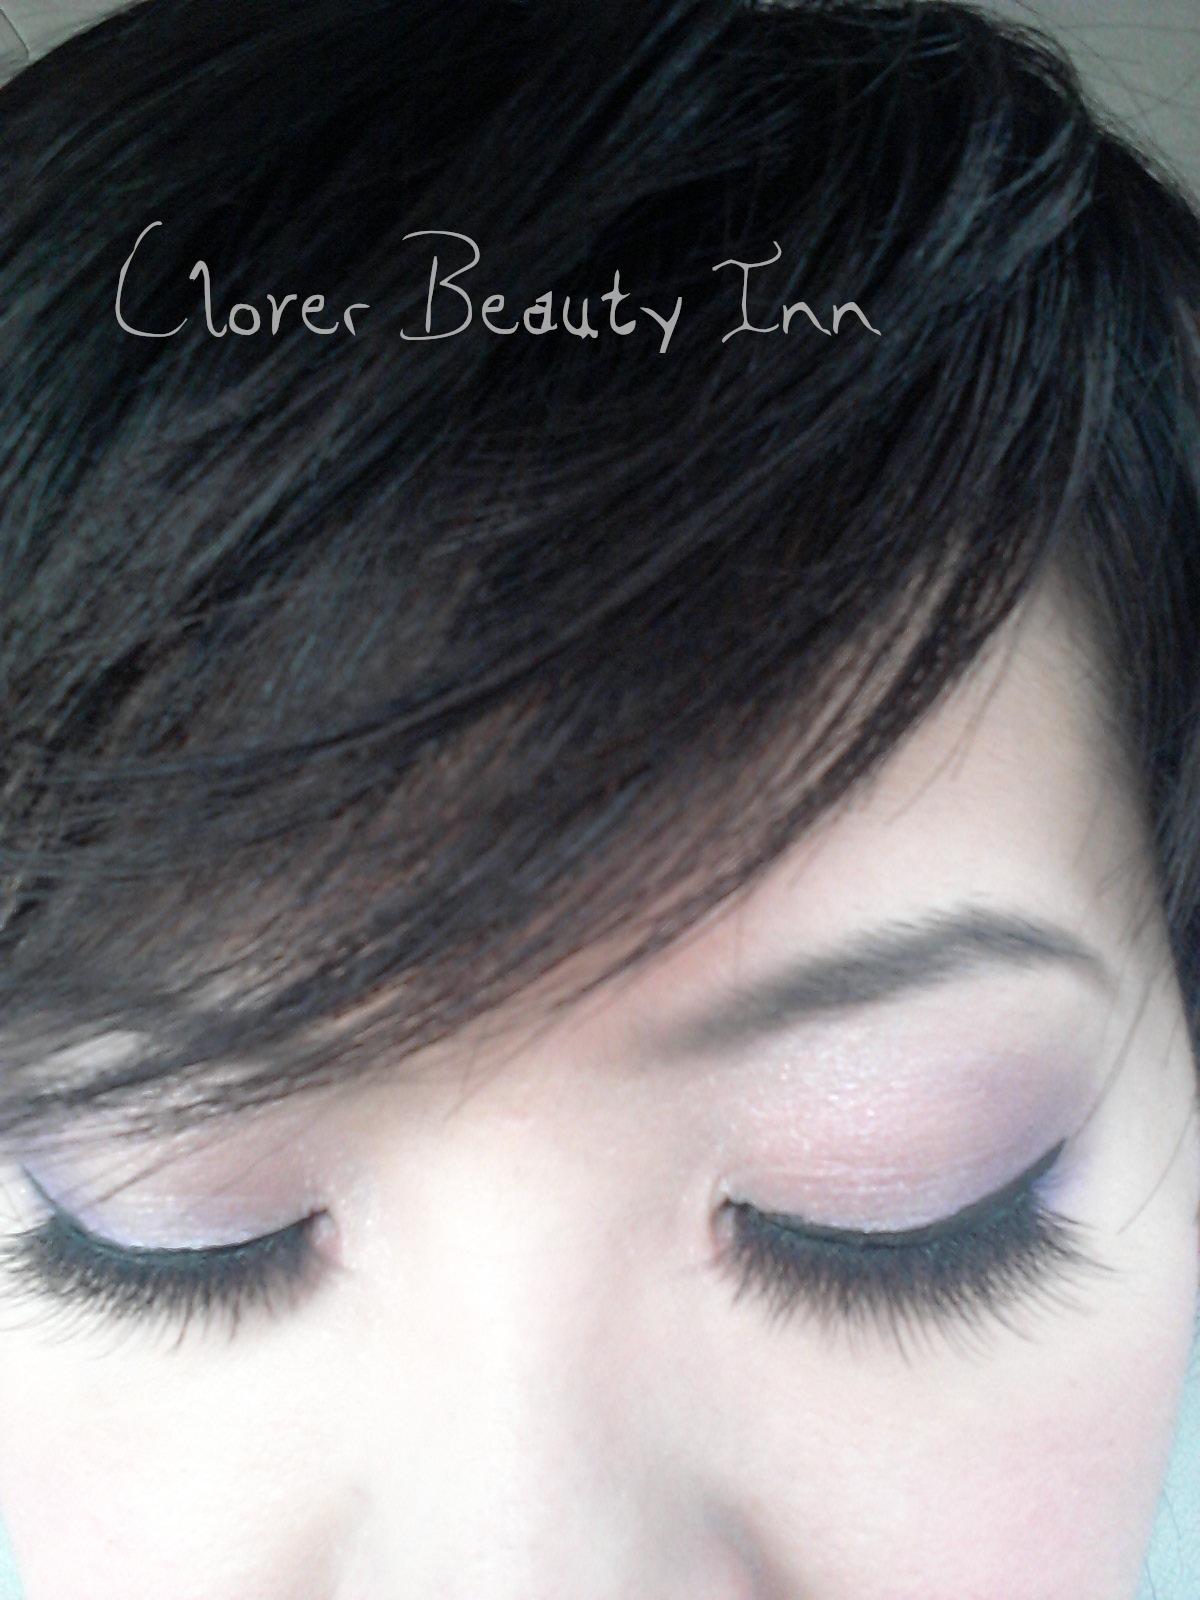 The Clover Beauty Inn Lotd Summer Colors Shu Uemura False Lashes